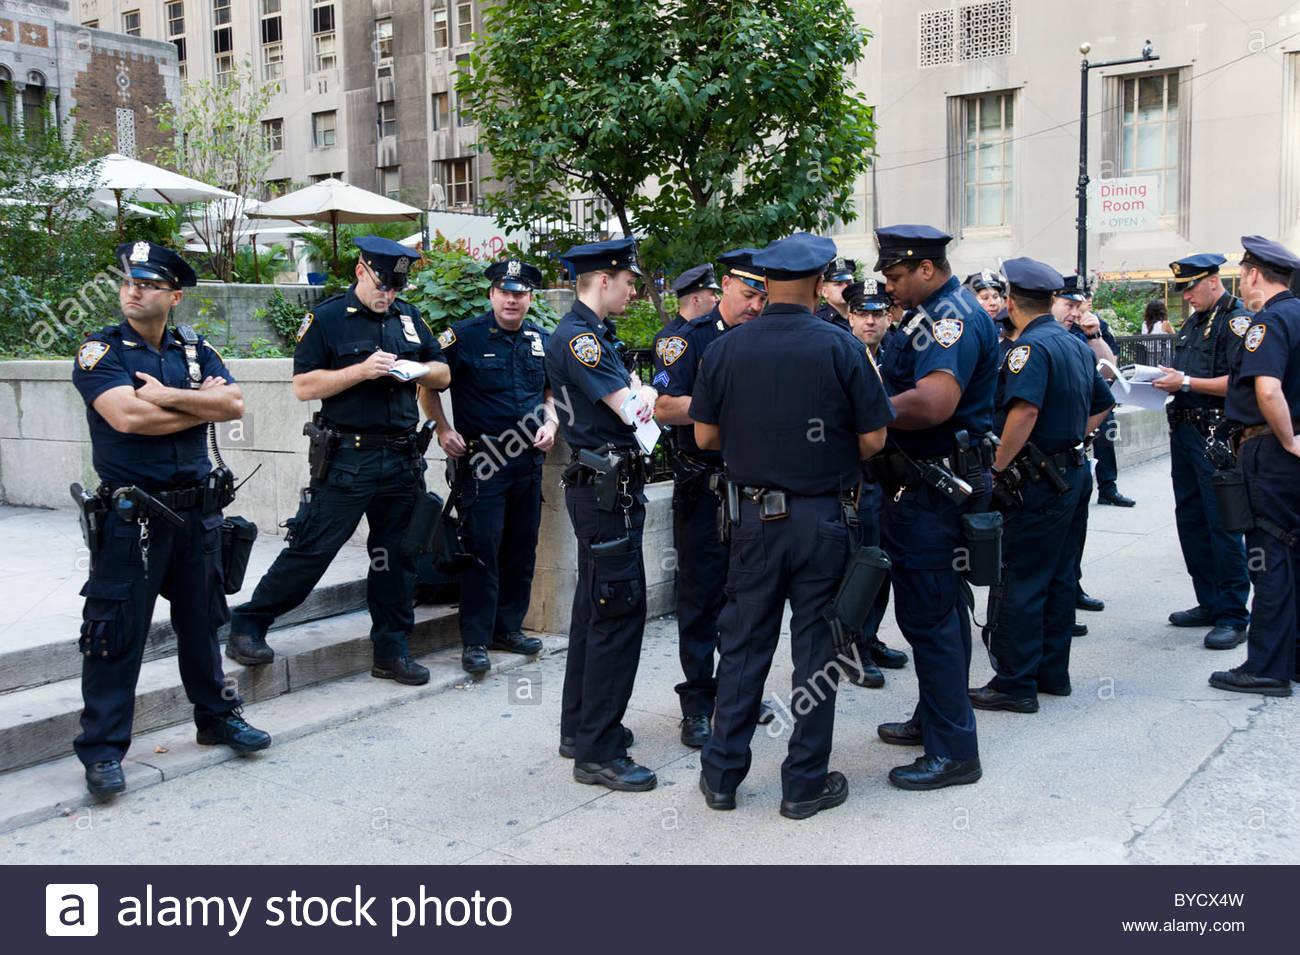 New York police waiting around, New York City, USA - Stock Image